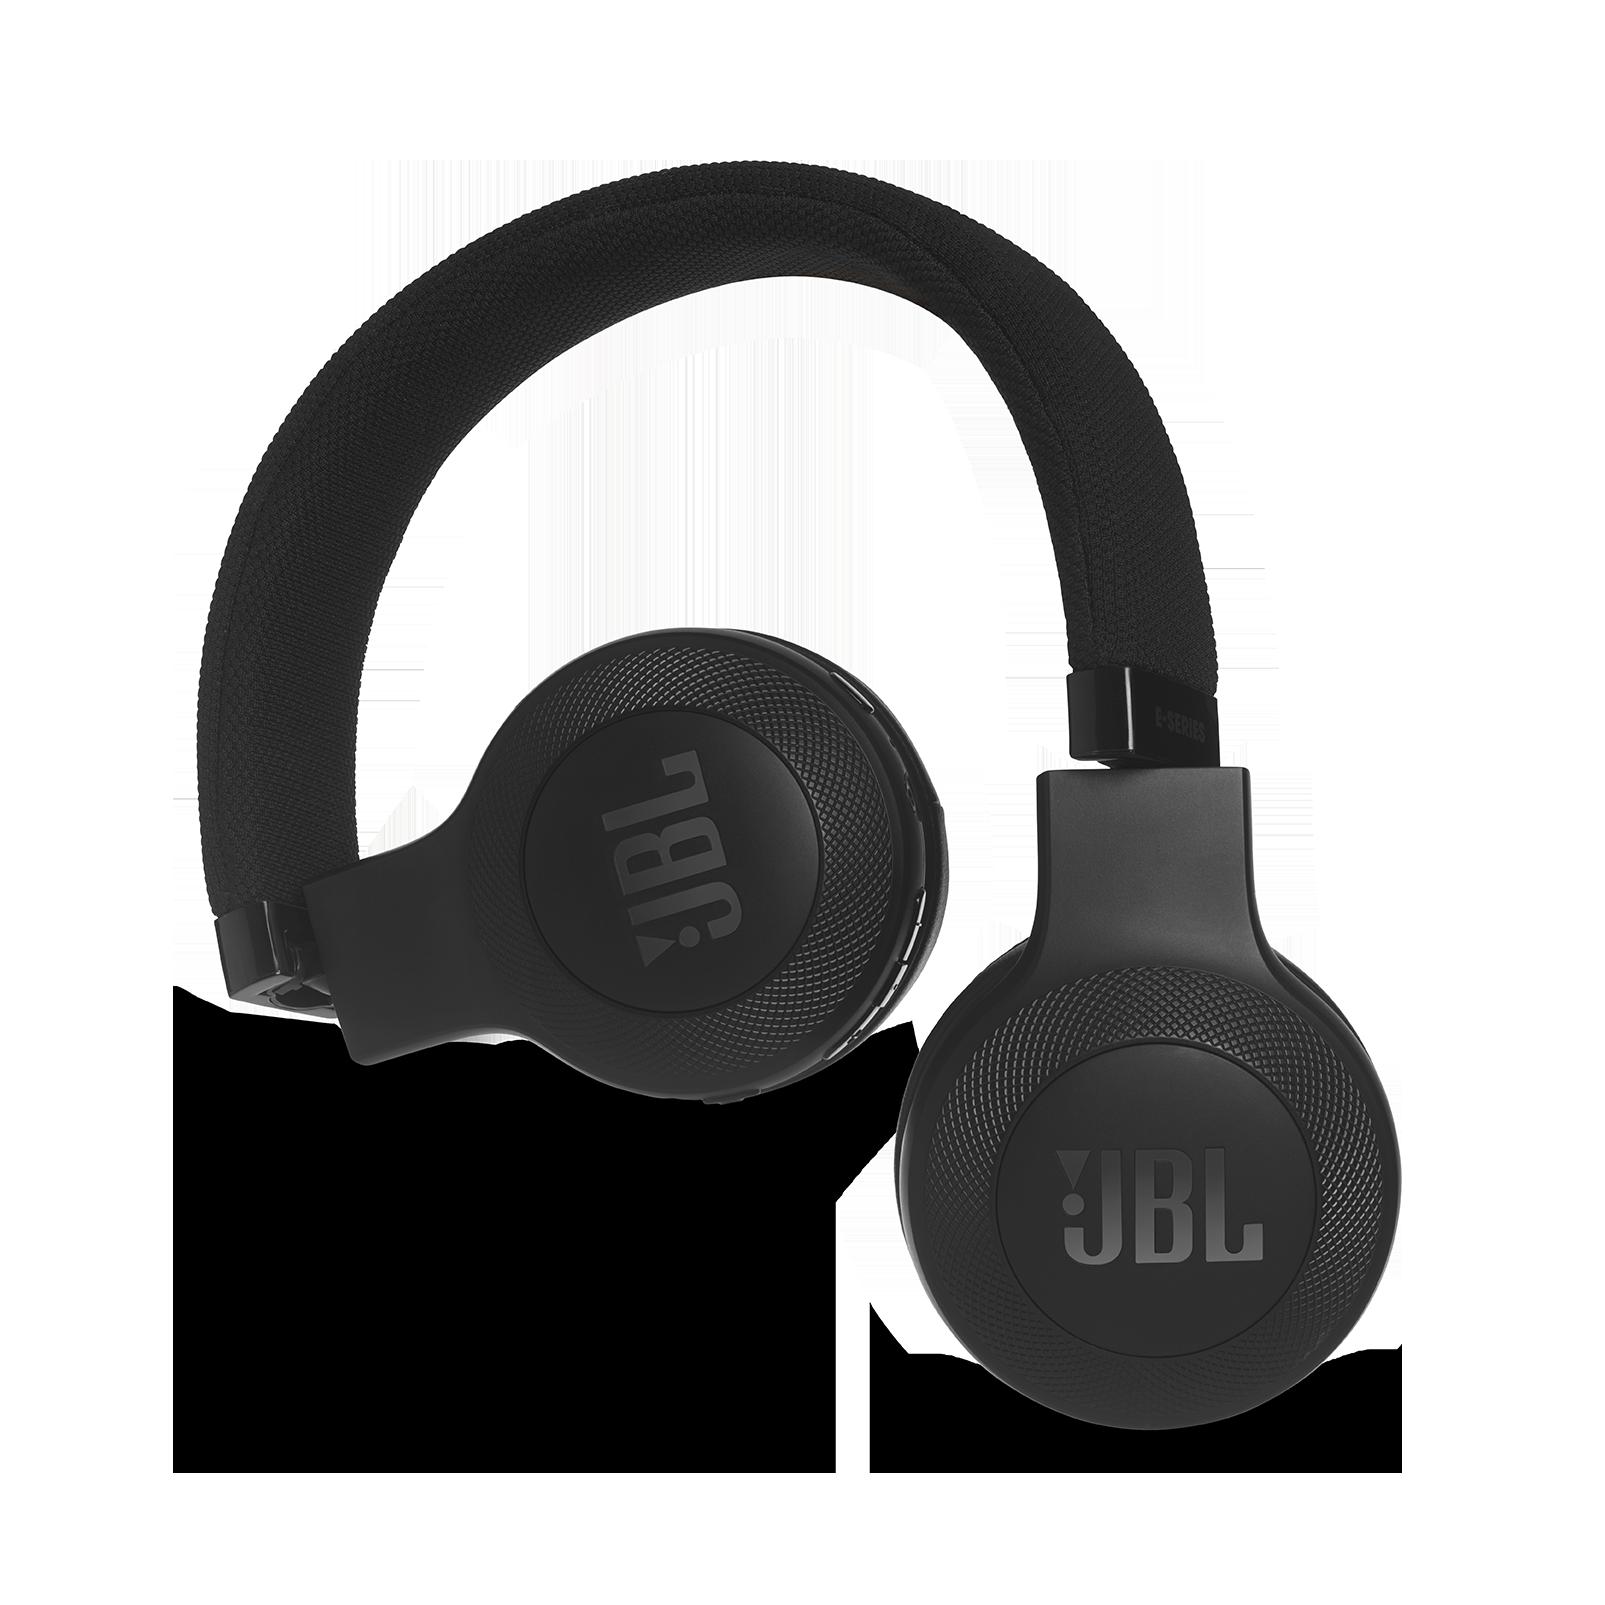 JBL E45BT - Black - Wireless on-ear headphones - Detailshot 1